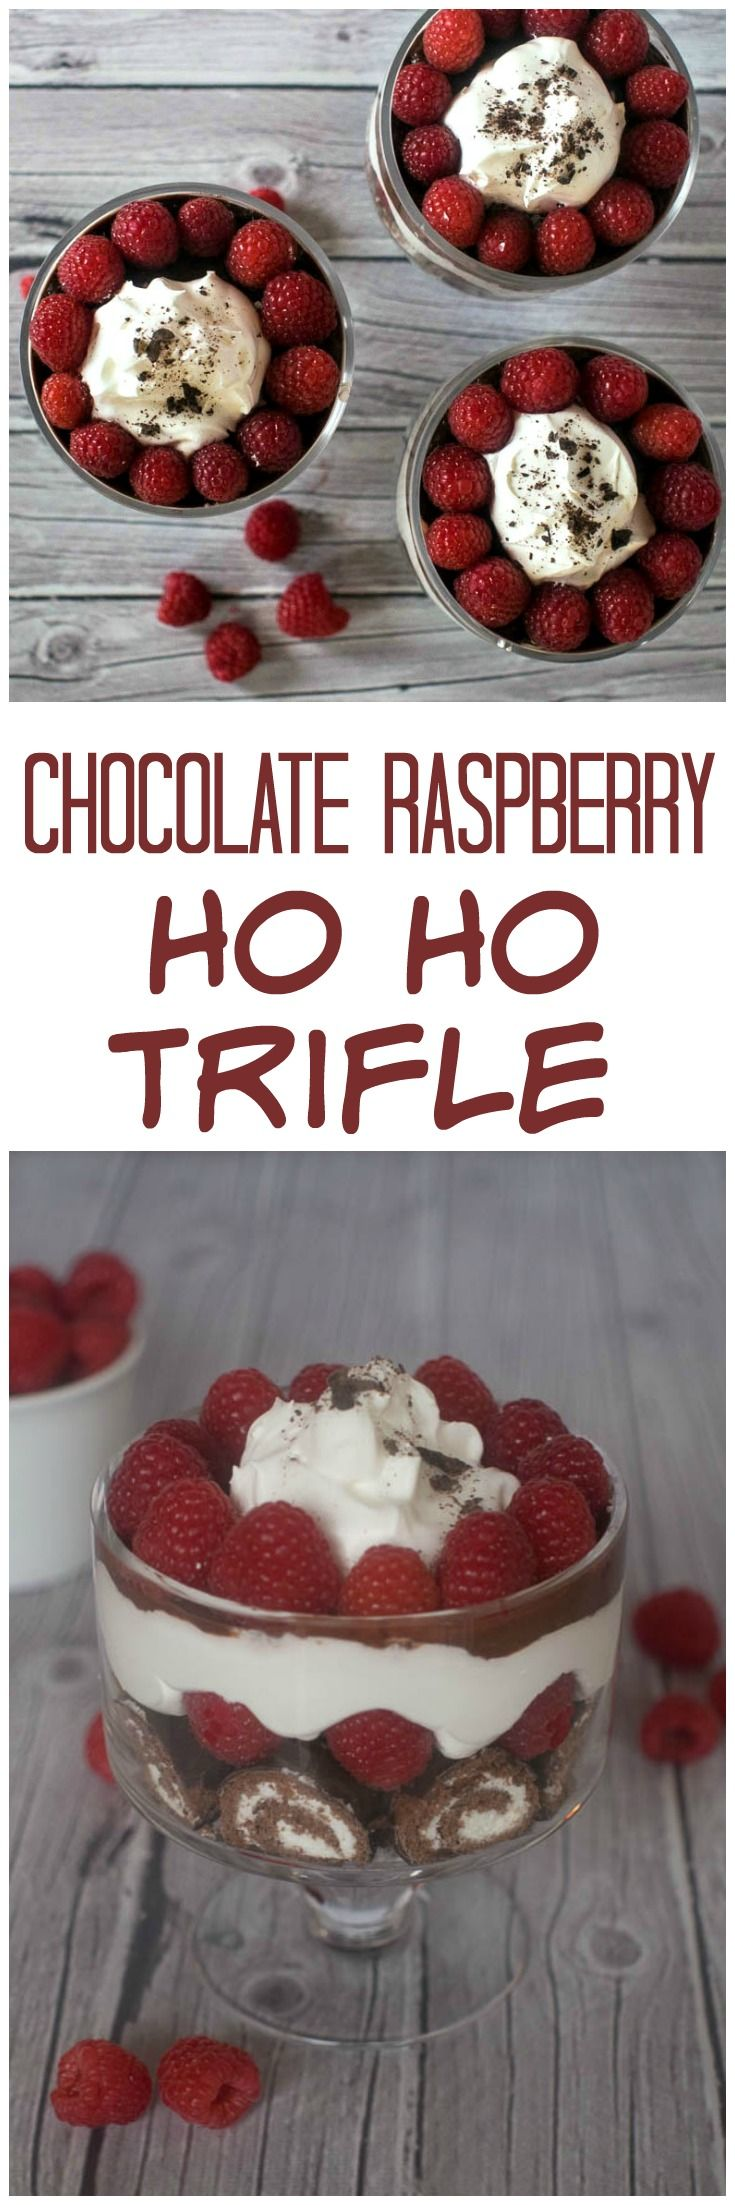 Chocolate Raspberry Ho Ho Trifle   Easy Dessert   Valentine's Day   HoHo   Trifle   15 Minute Dessert   5 Ingredient Dessert   Raspberries